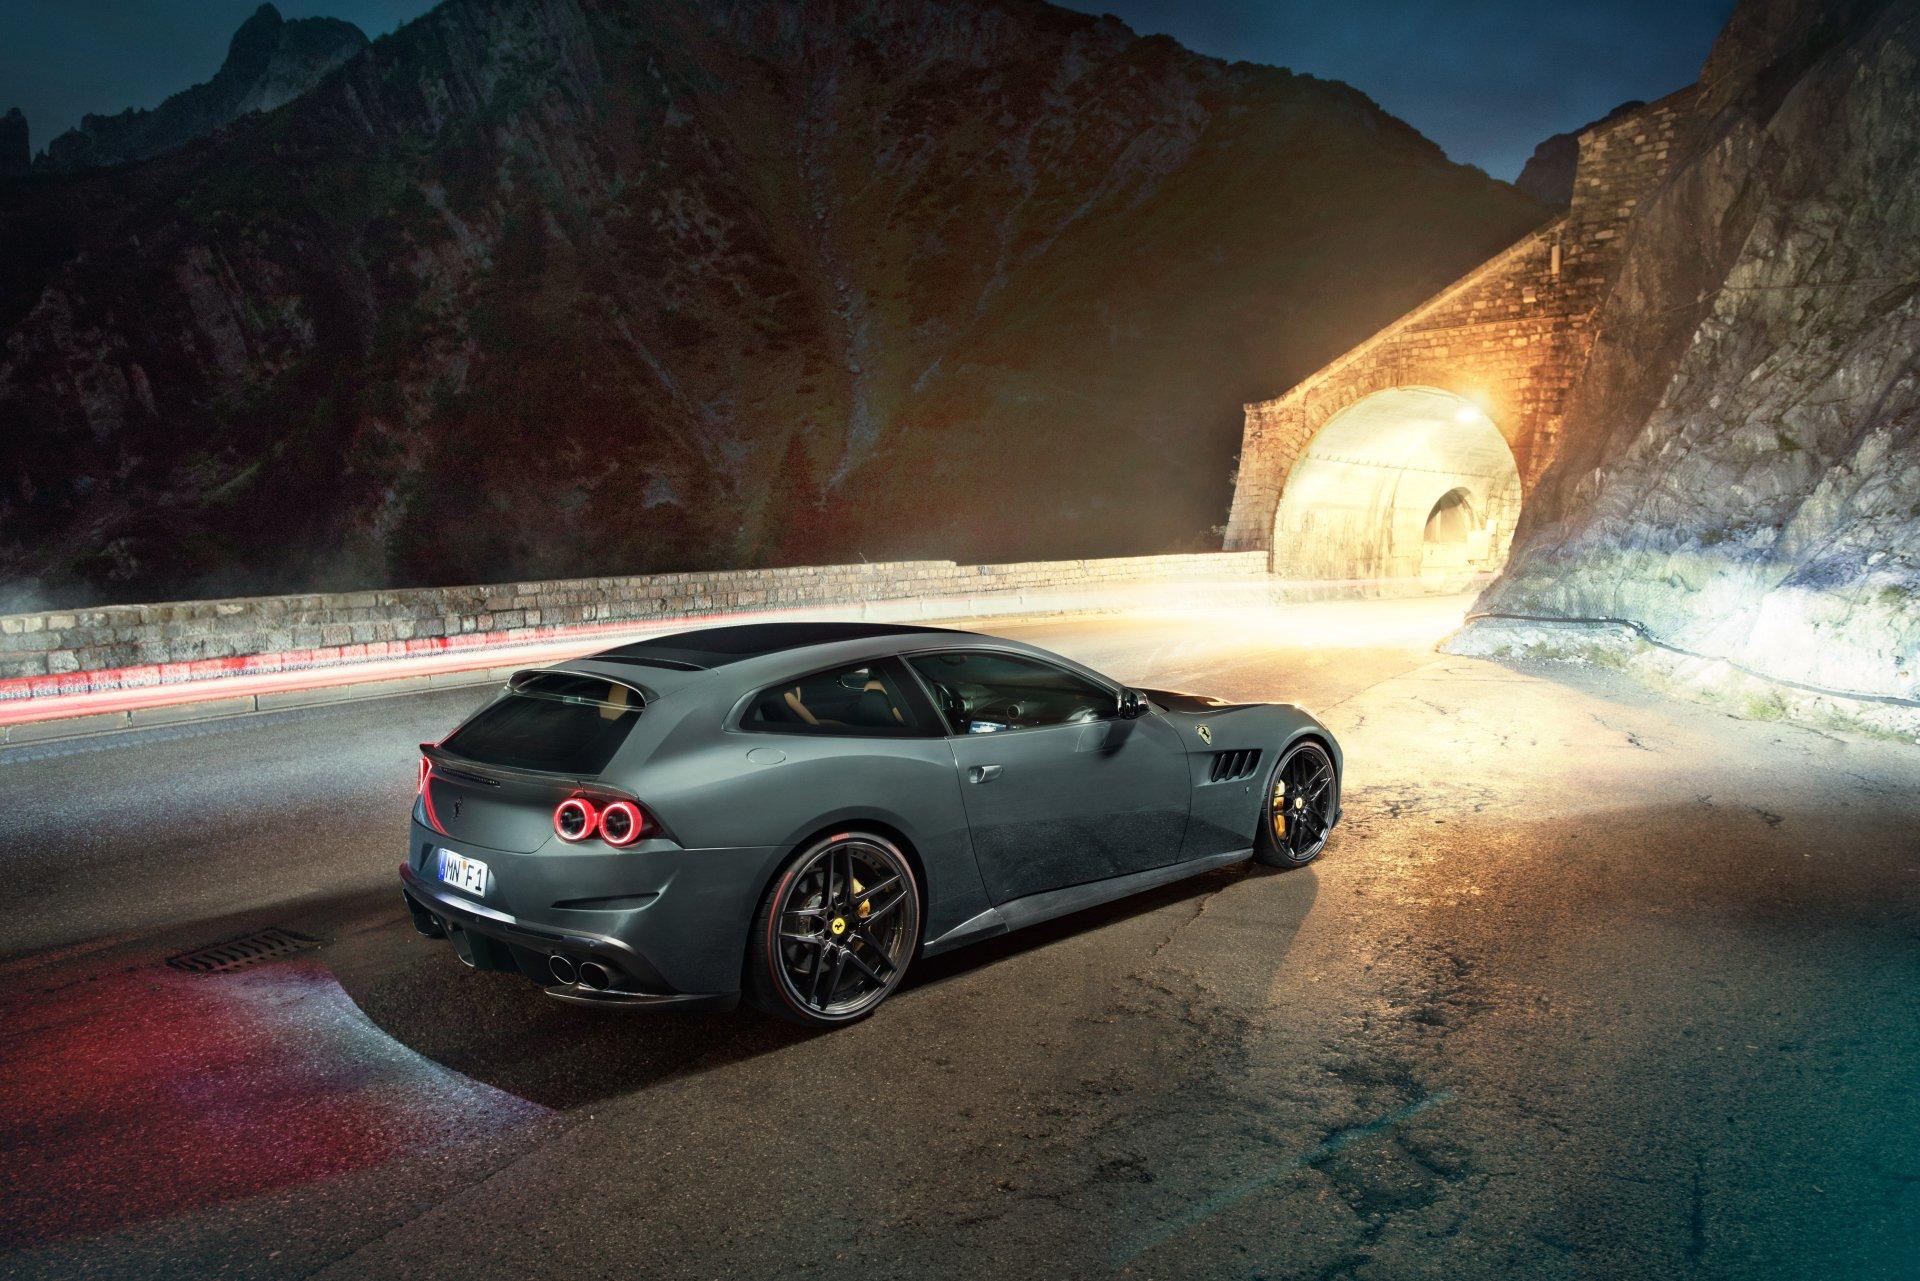 Vehicles - Ferrari GTC4Lusso  Novitec Rosso Ferrari GTC4Lusso Sport Car Supercar Tuning Car Wallpaper